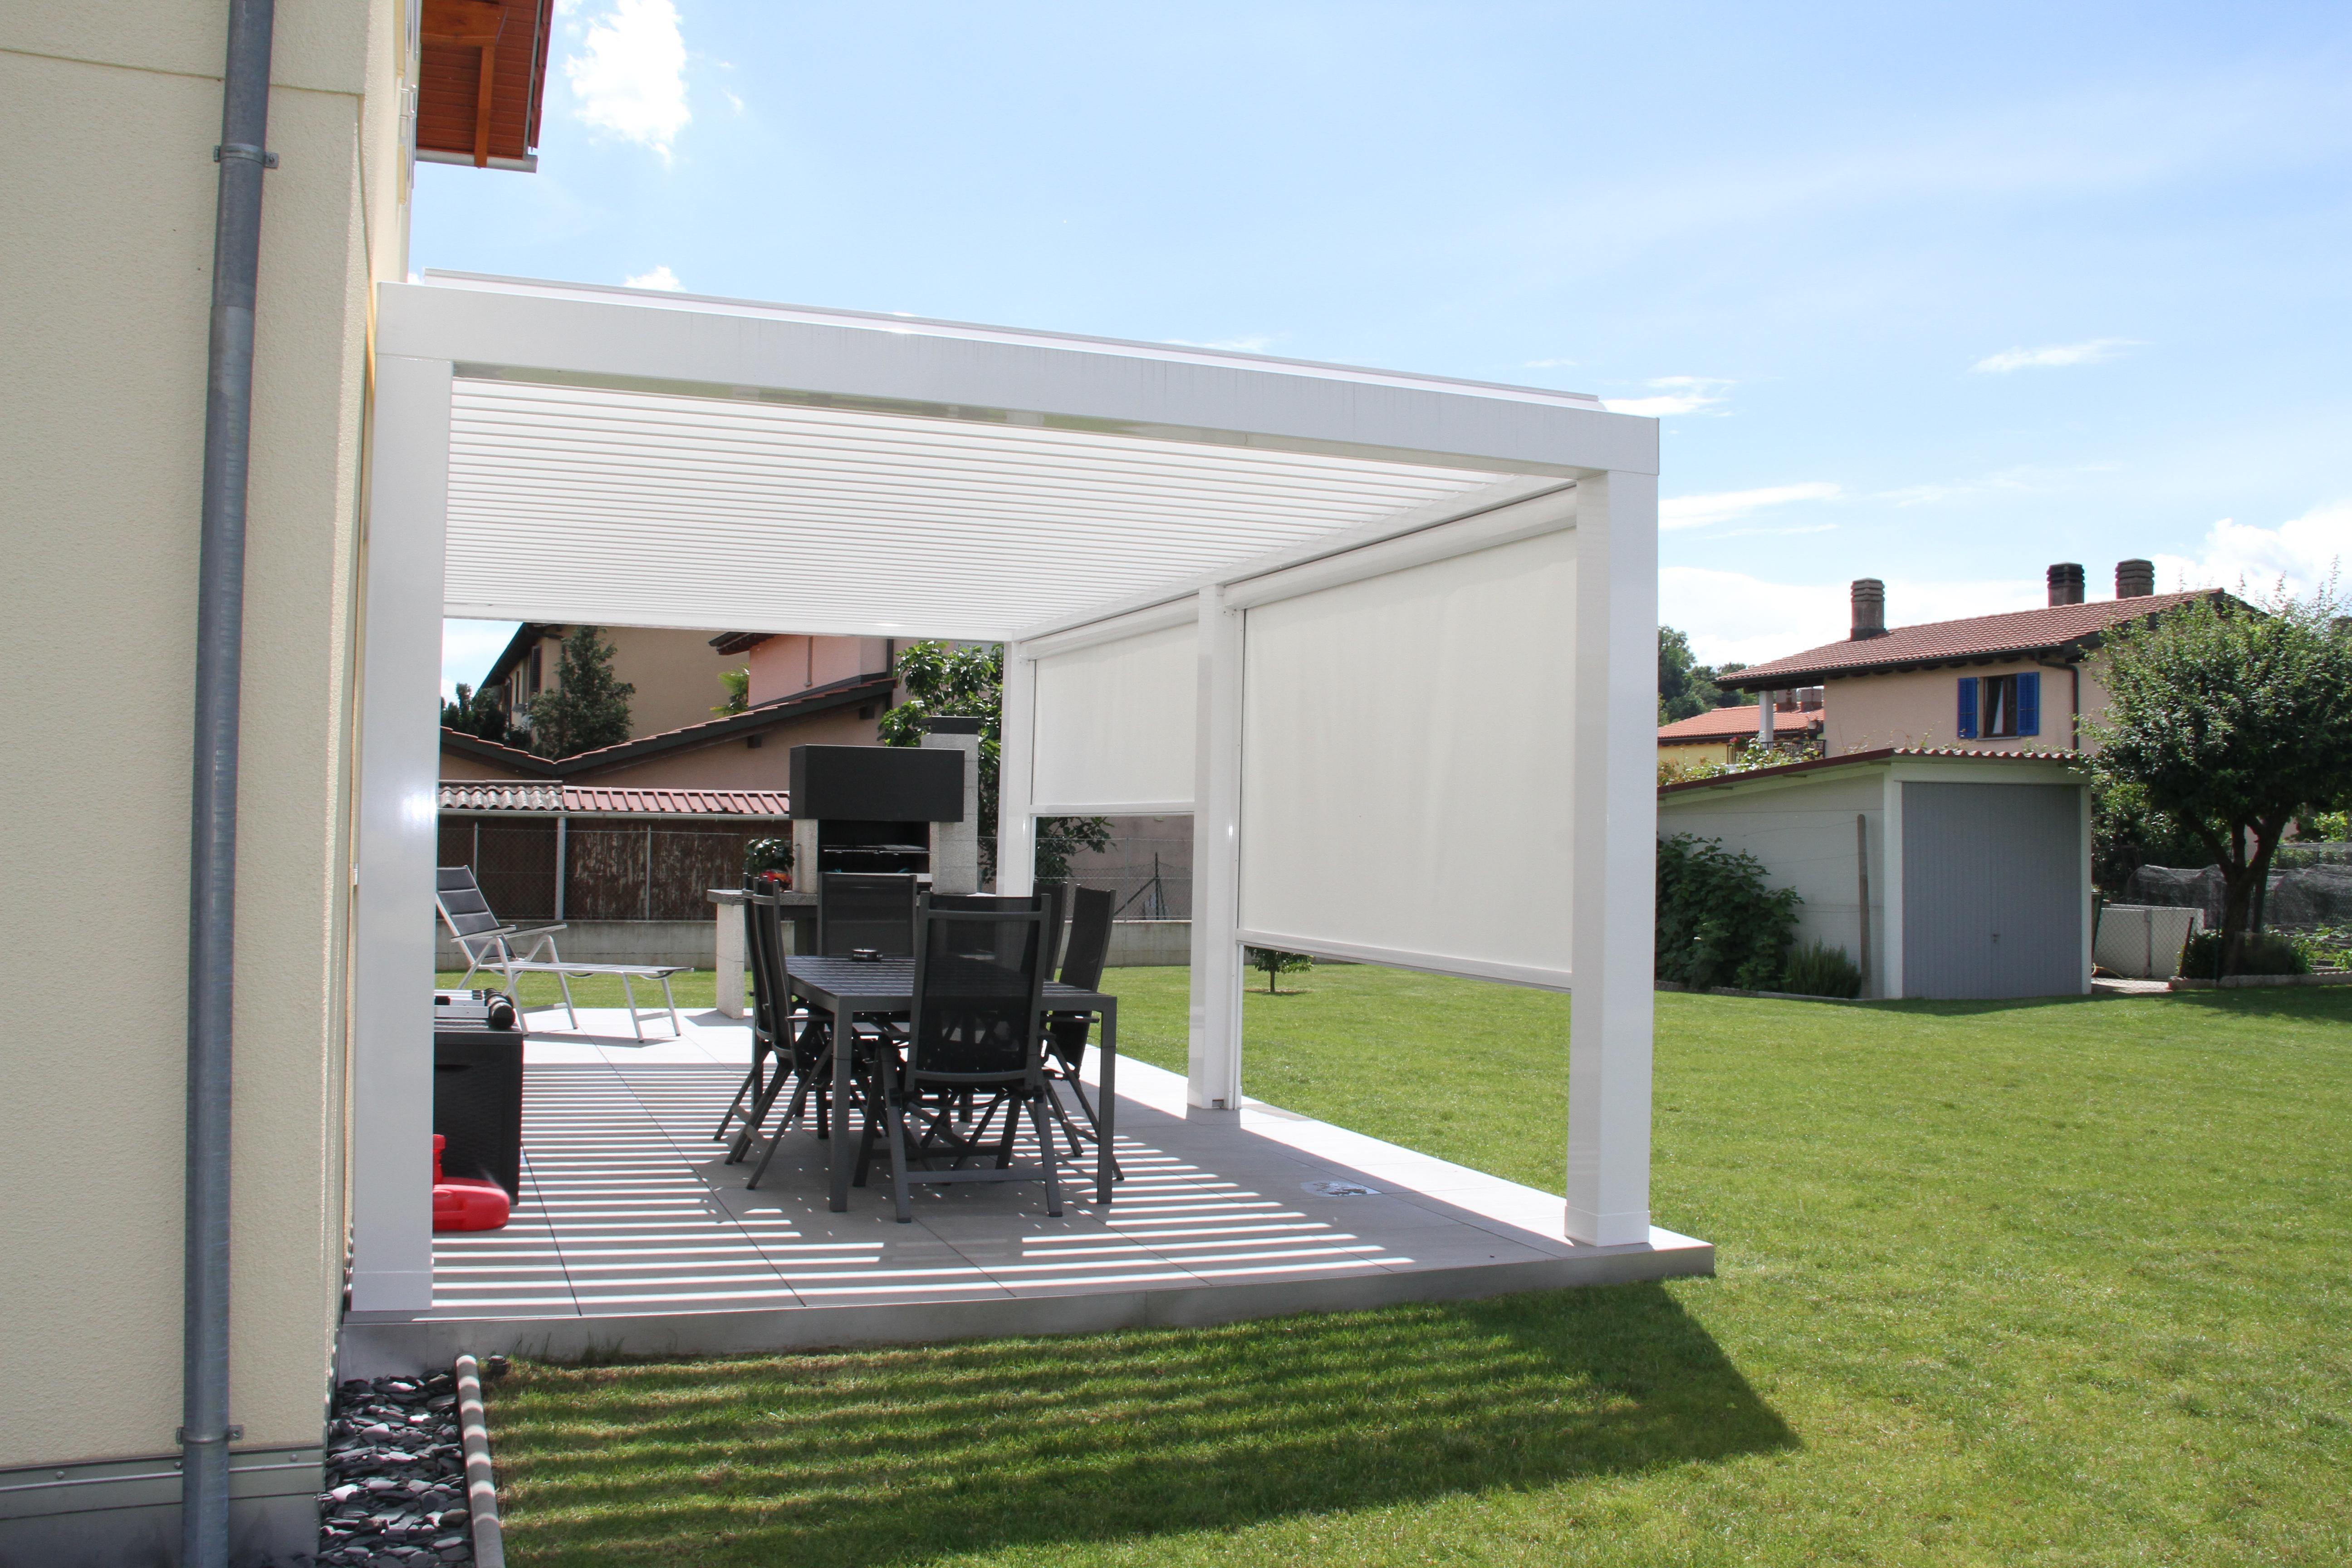 Servono Permessi Per Installare Una Pergotenda Cose Di Casa